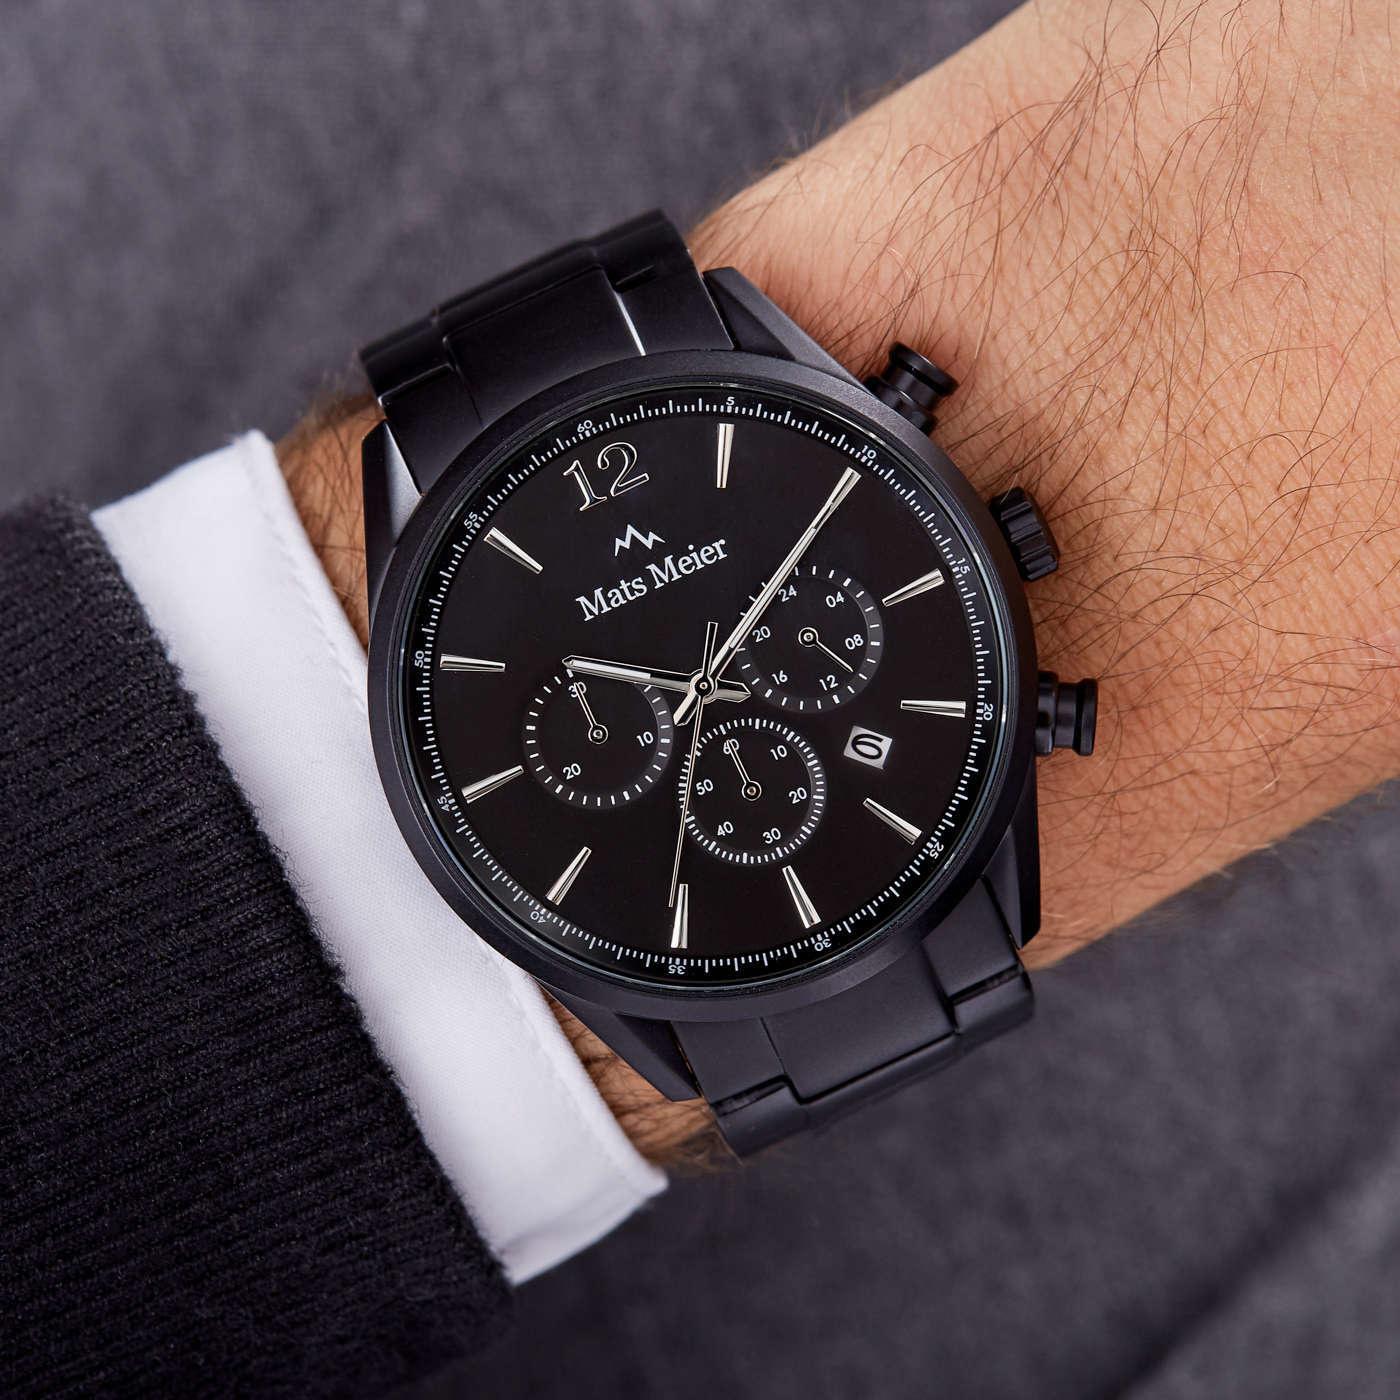 Mats Meier Grand Cornier chronograaf herenhorloge mat zwart